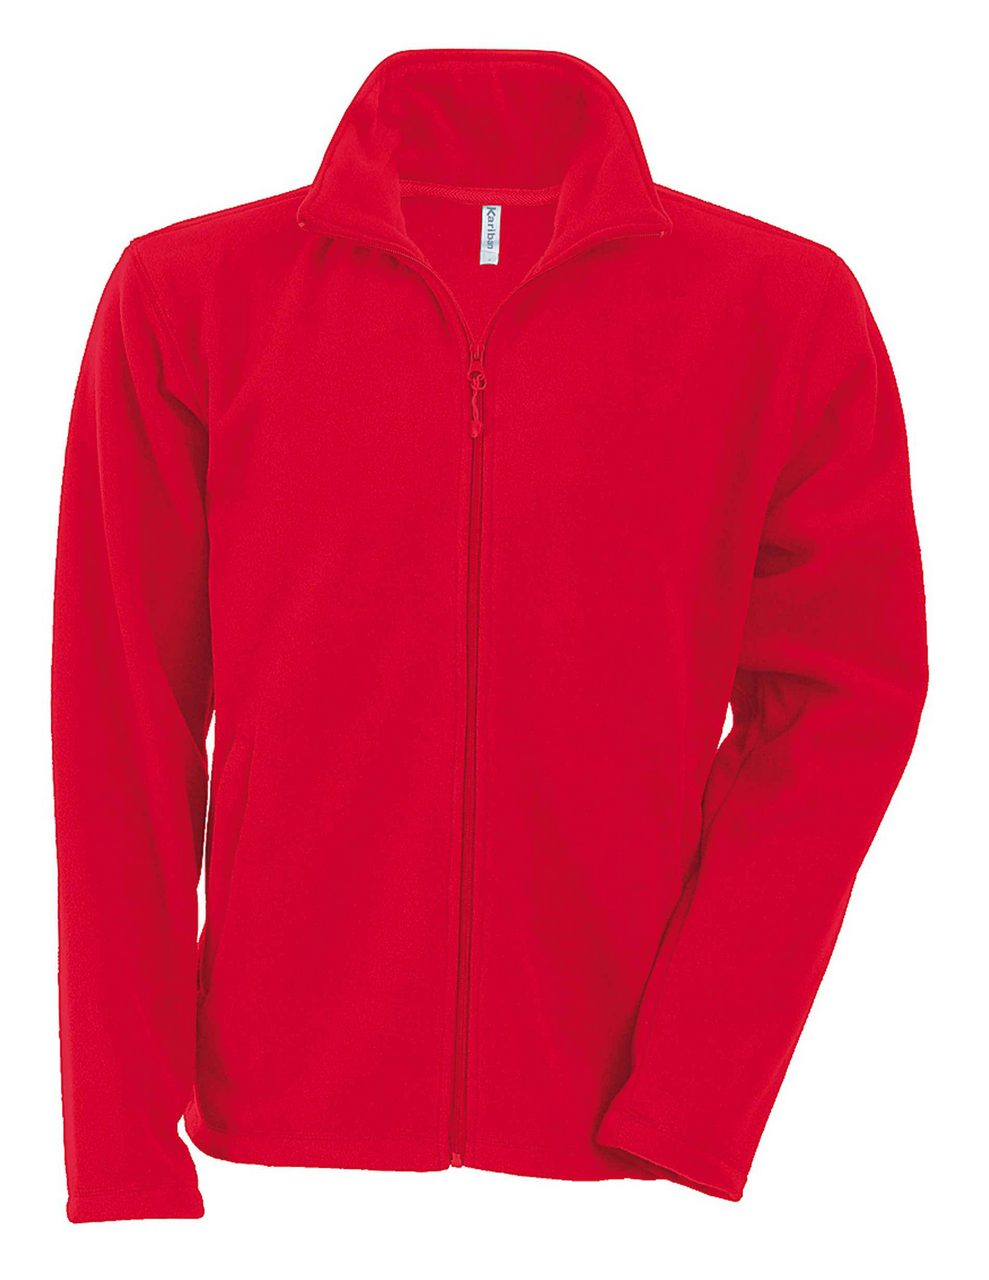 Fleece KA911 rosu veste jachete dama barbatesti polar fleece softshell fas gluga ploaie vant broderie serigrafie termotransfer | Toroadv.ro